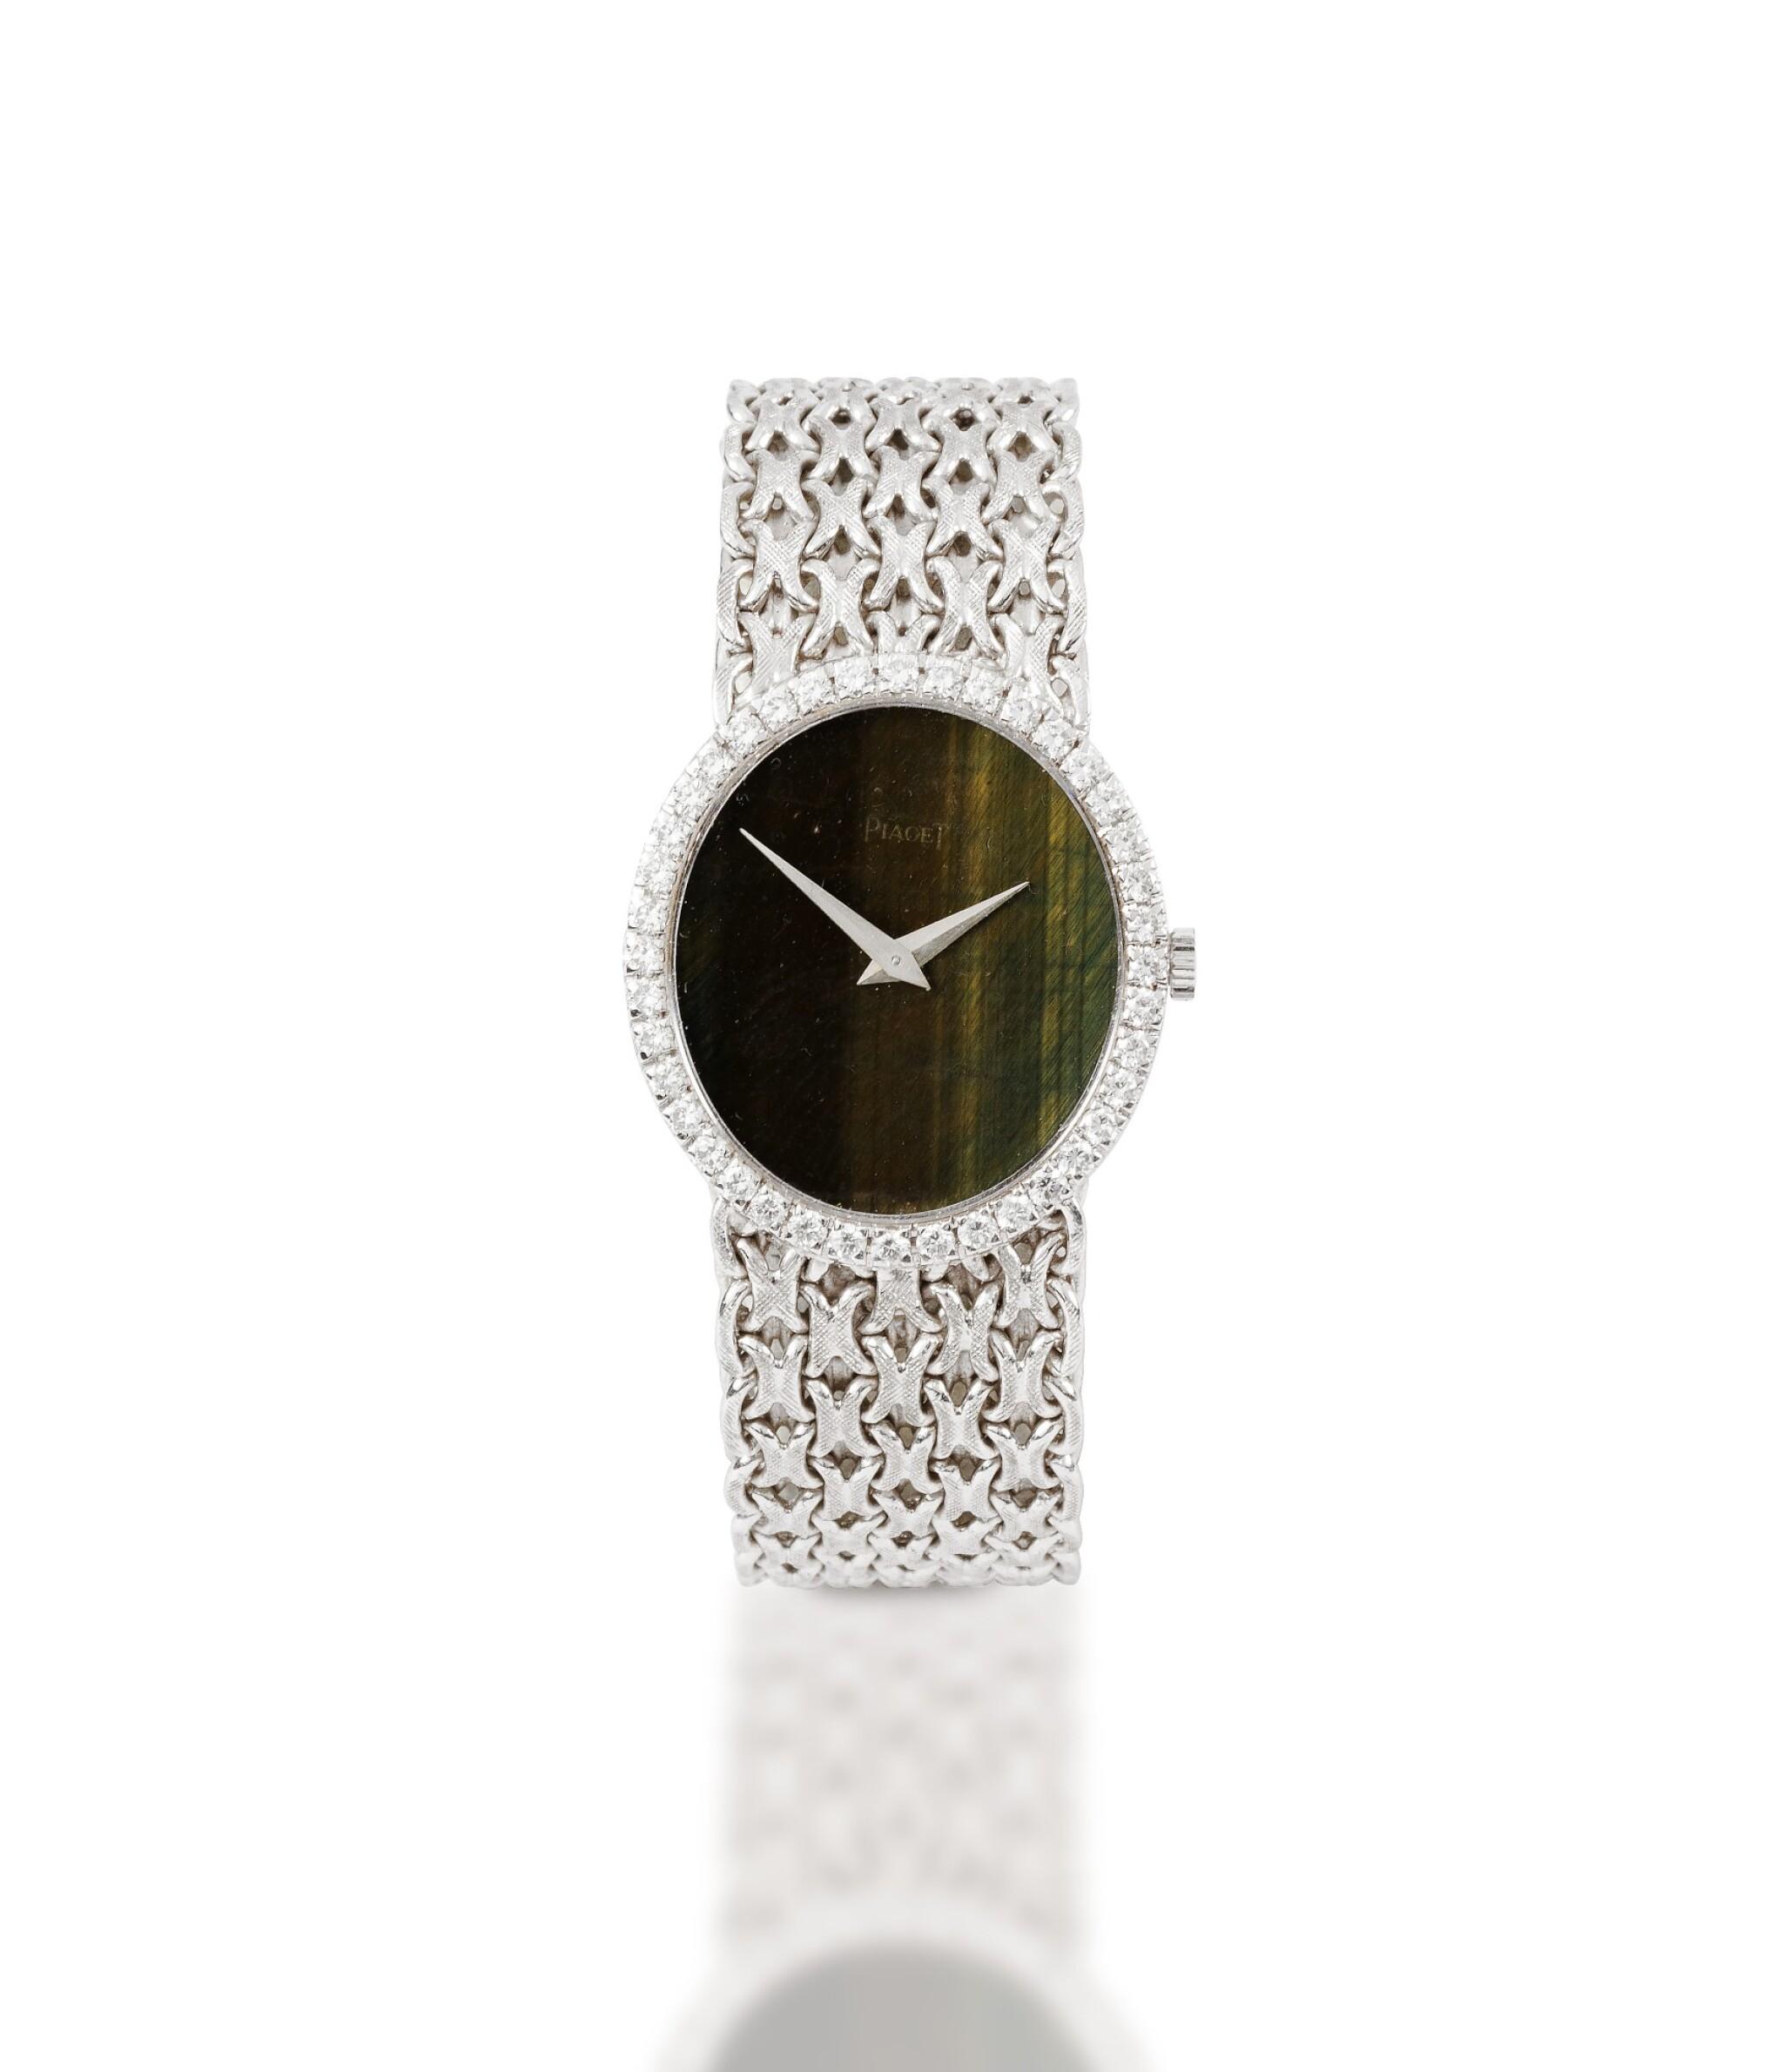 View full screen - View 1 of Lot 125. Piaget | Montre bracelet de dame or et diamants | Lady's gold and diamond bracelet watch.